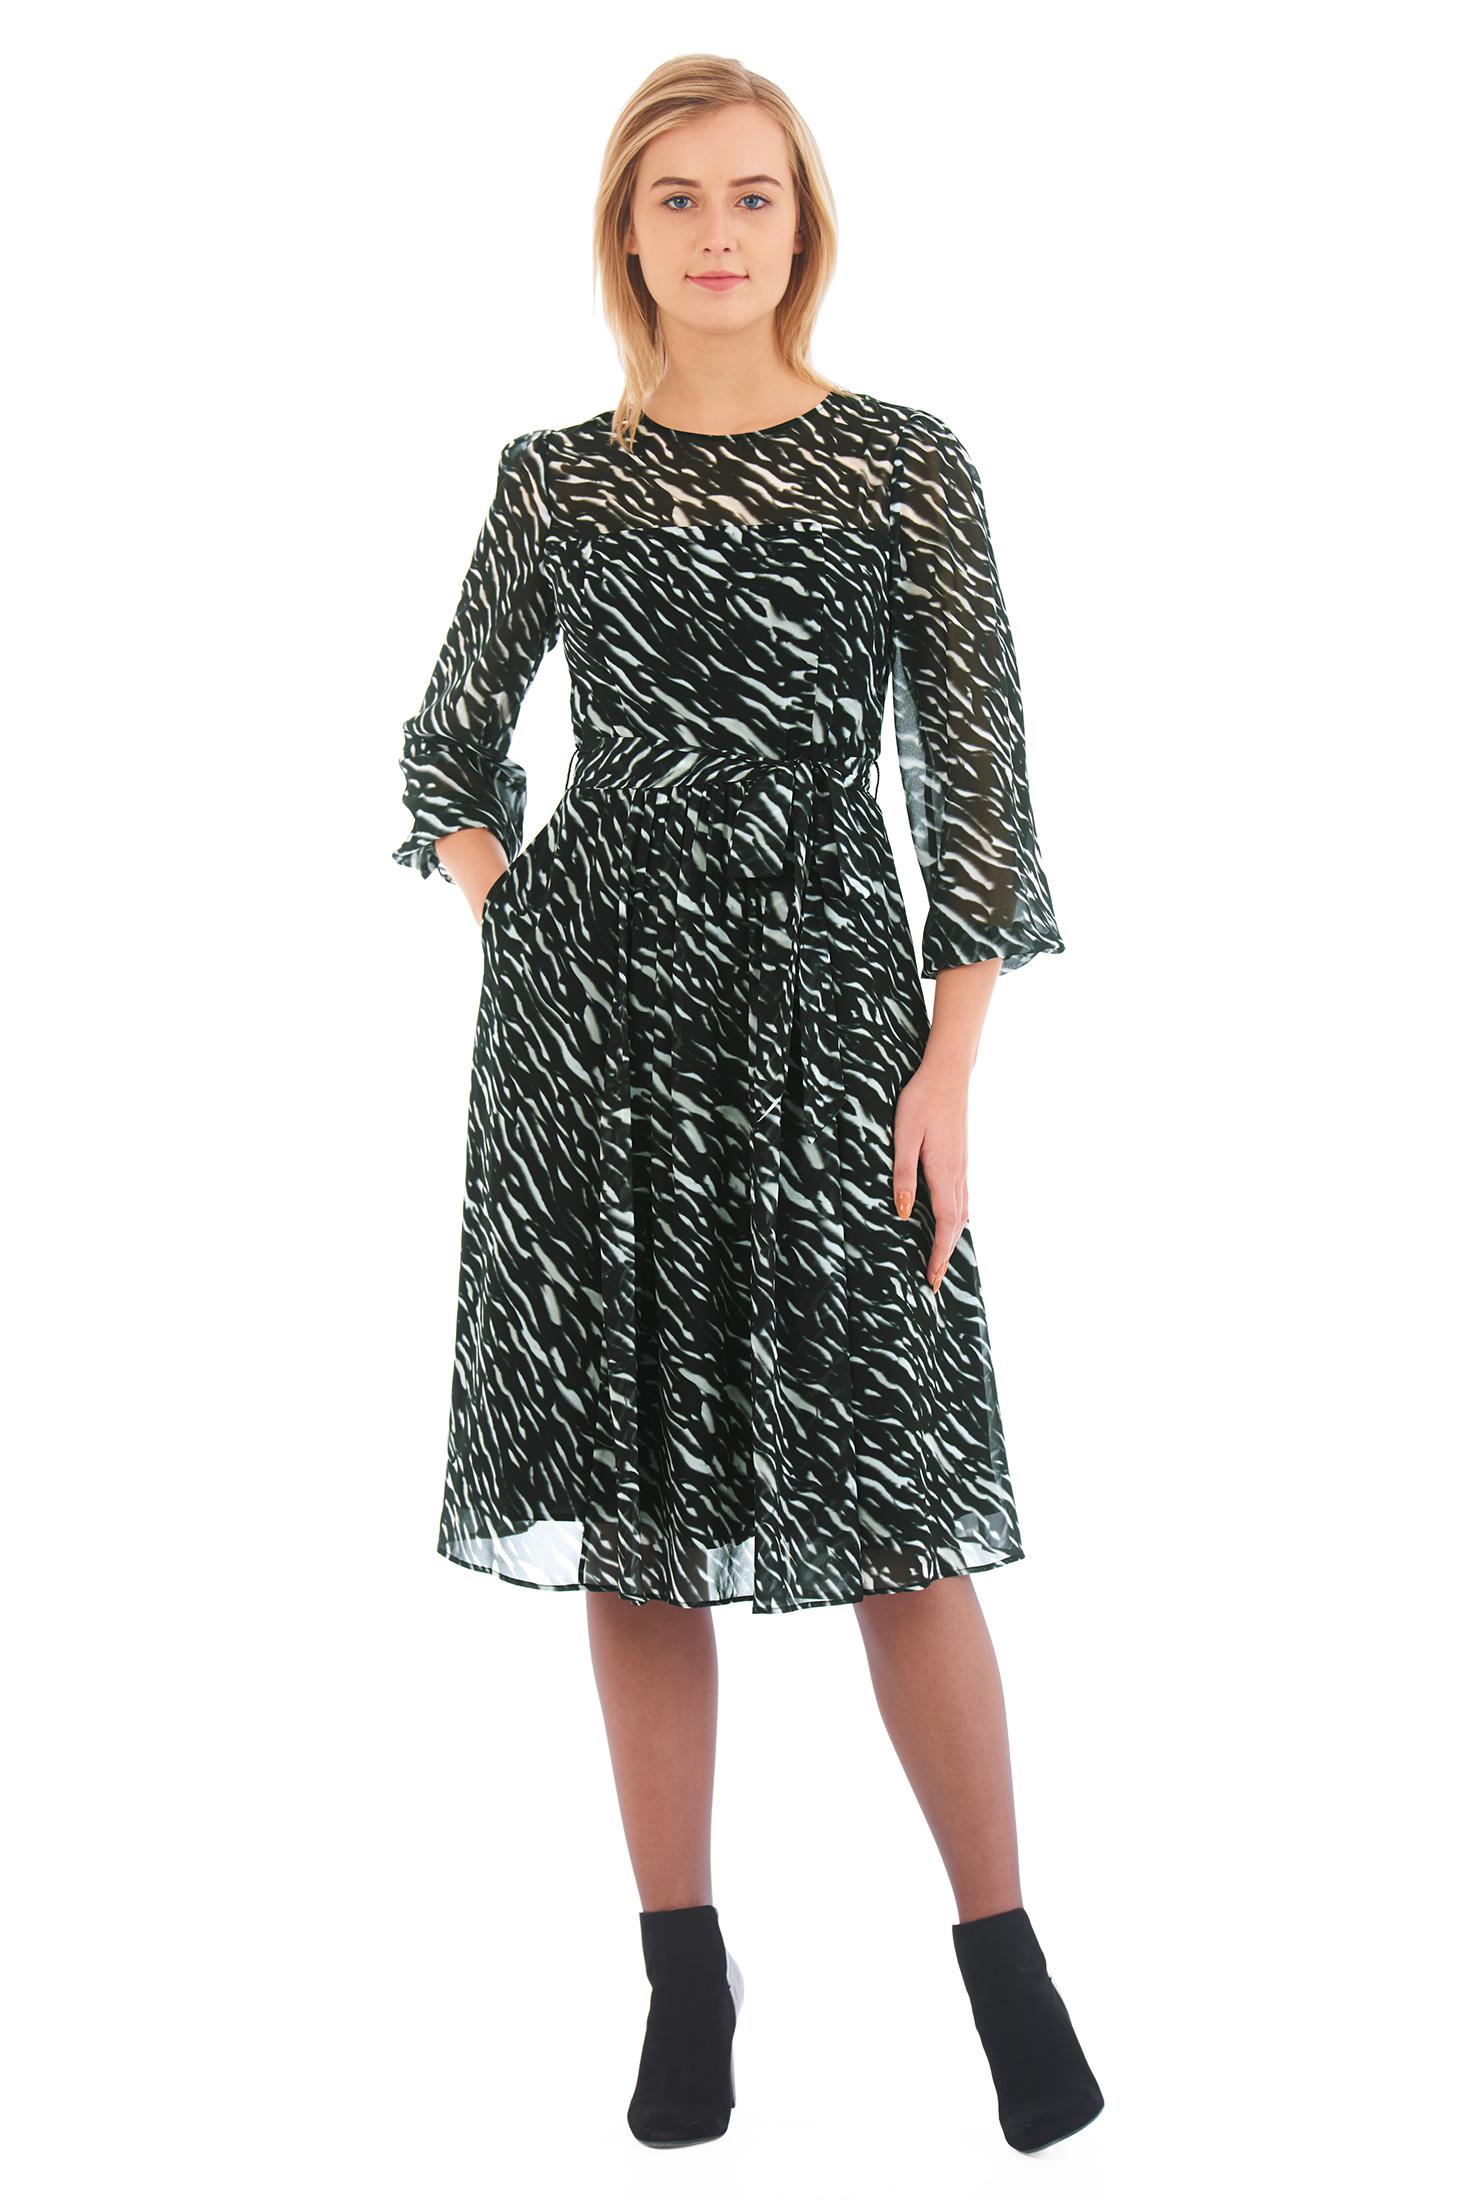 Image of eShakti Women's Animal print georgette sash tie dress